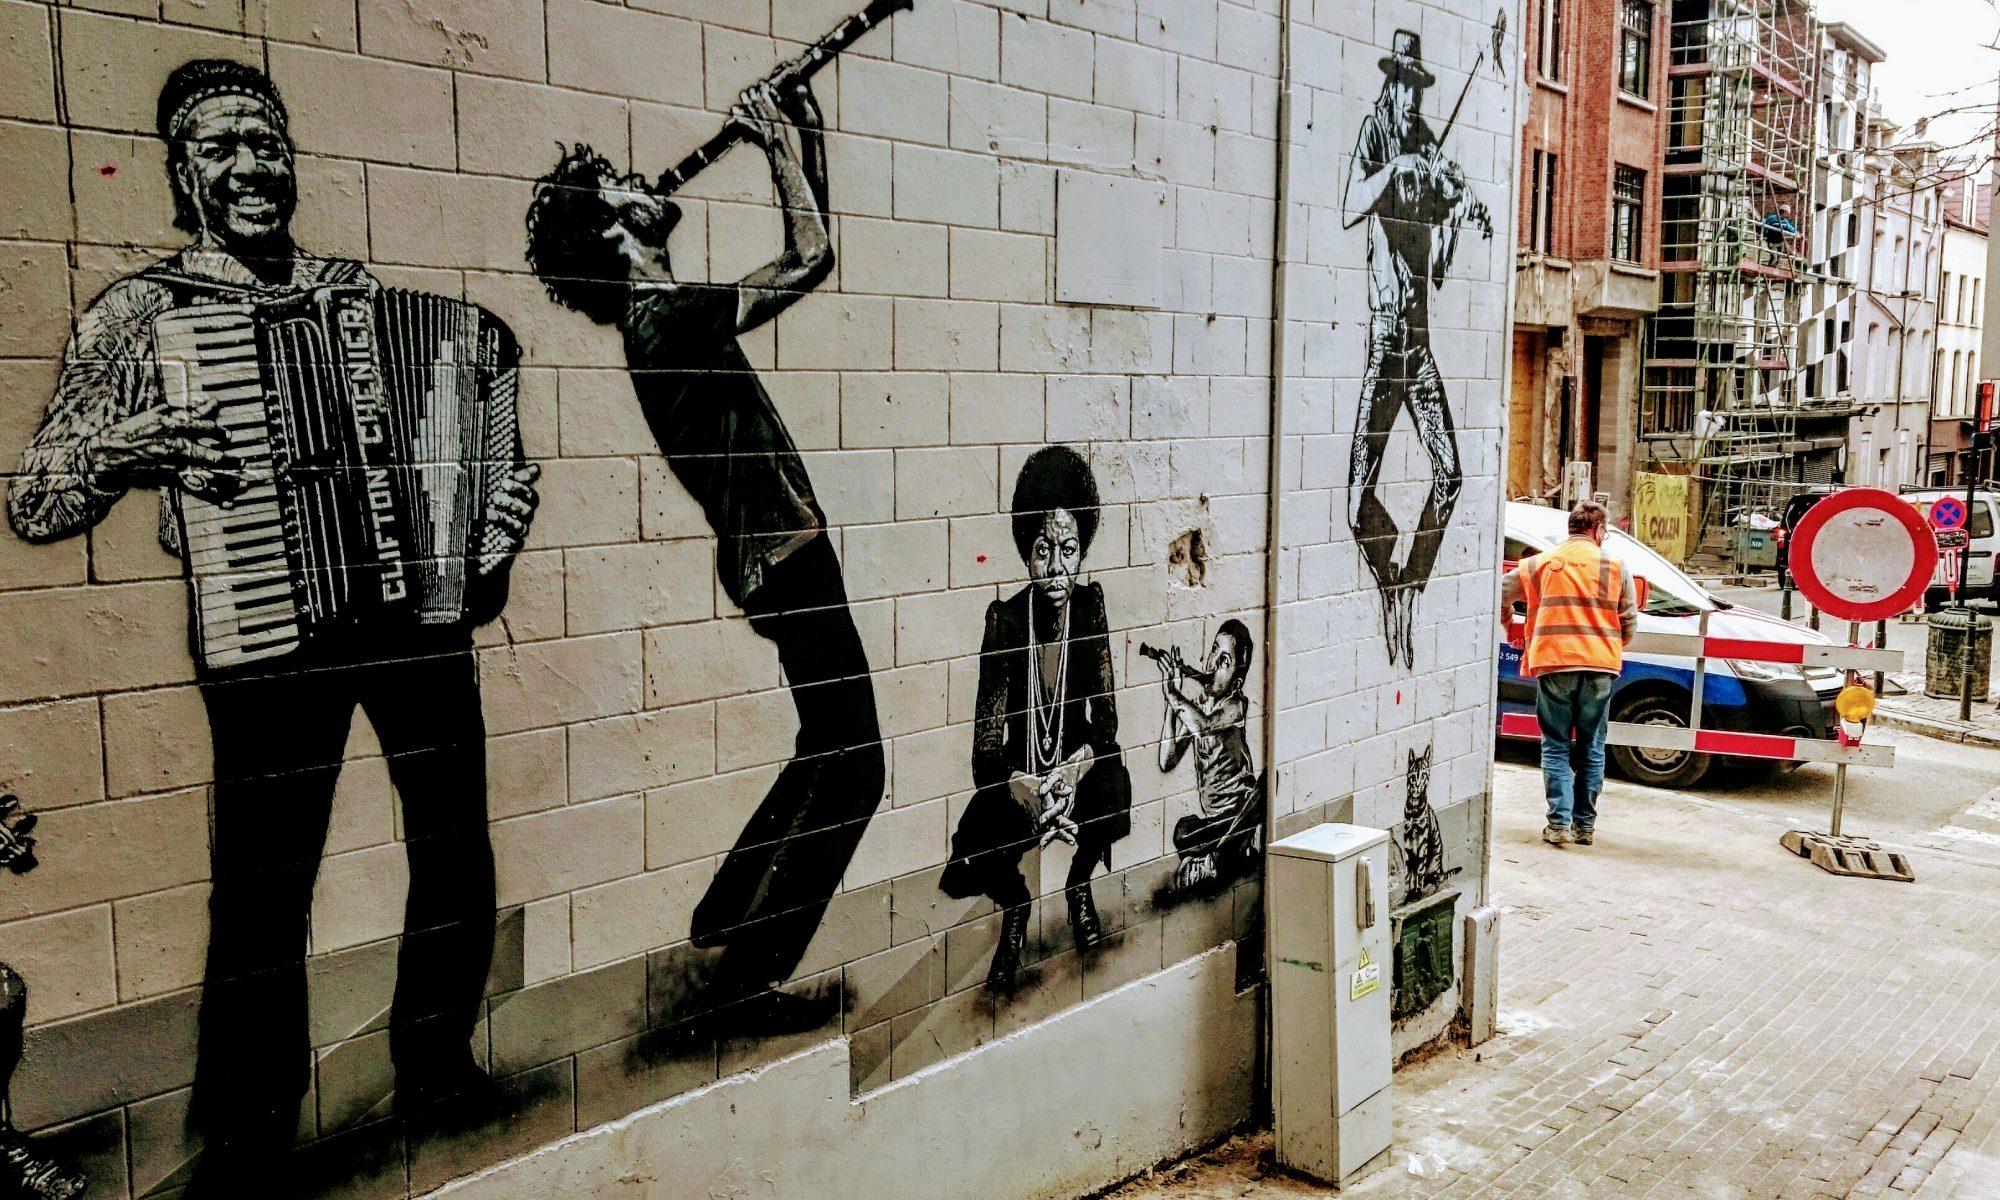 Street Art, Brussels, Brüssel, Marolles, Urban Art, Art, Music